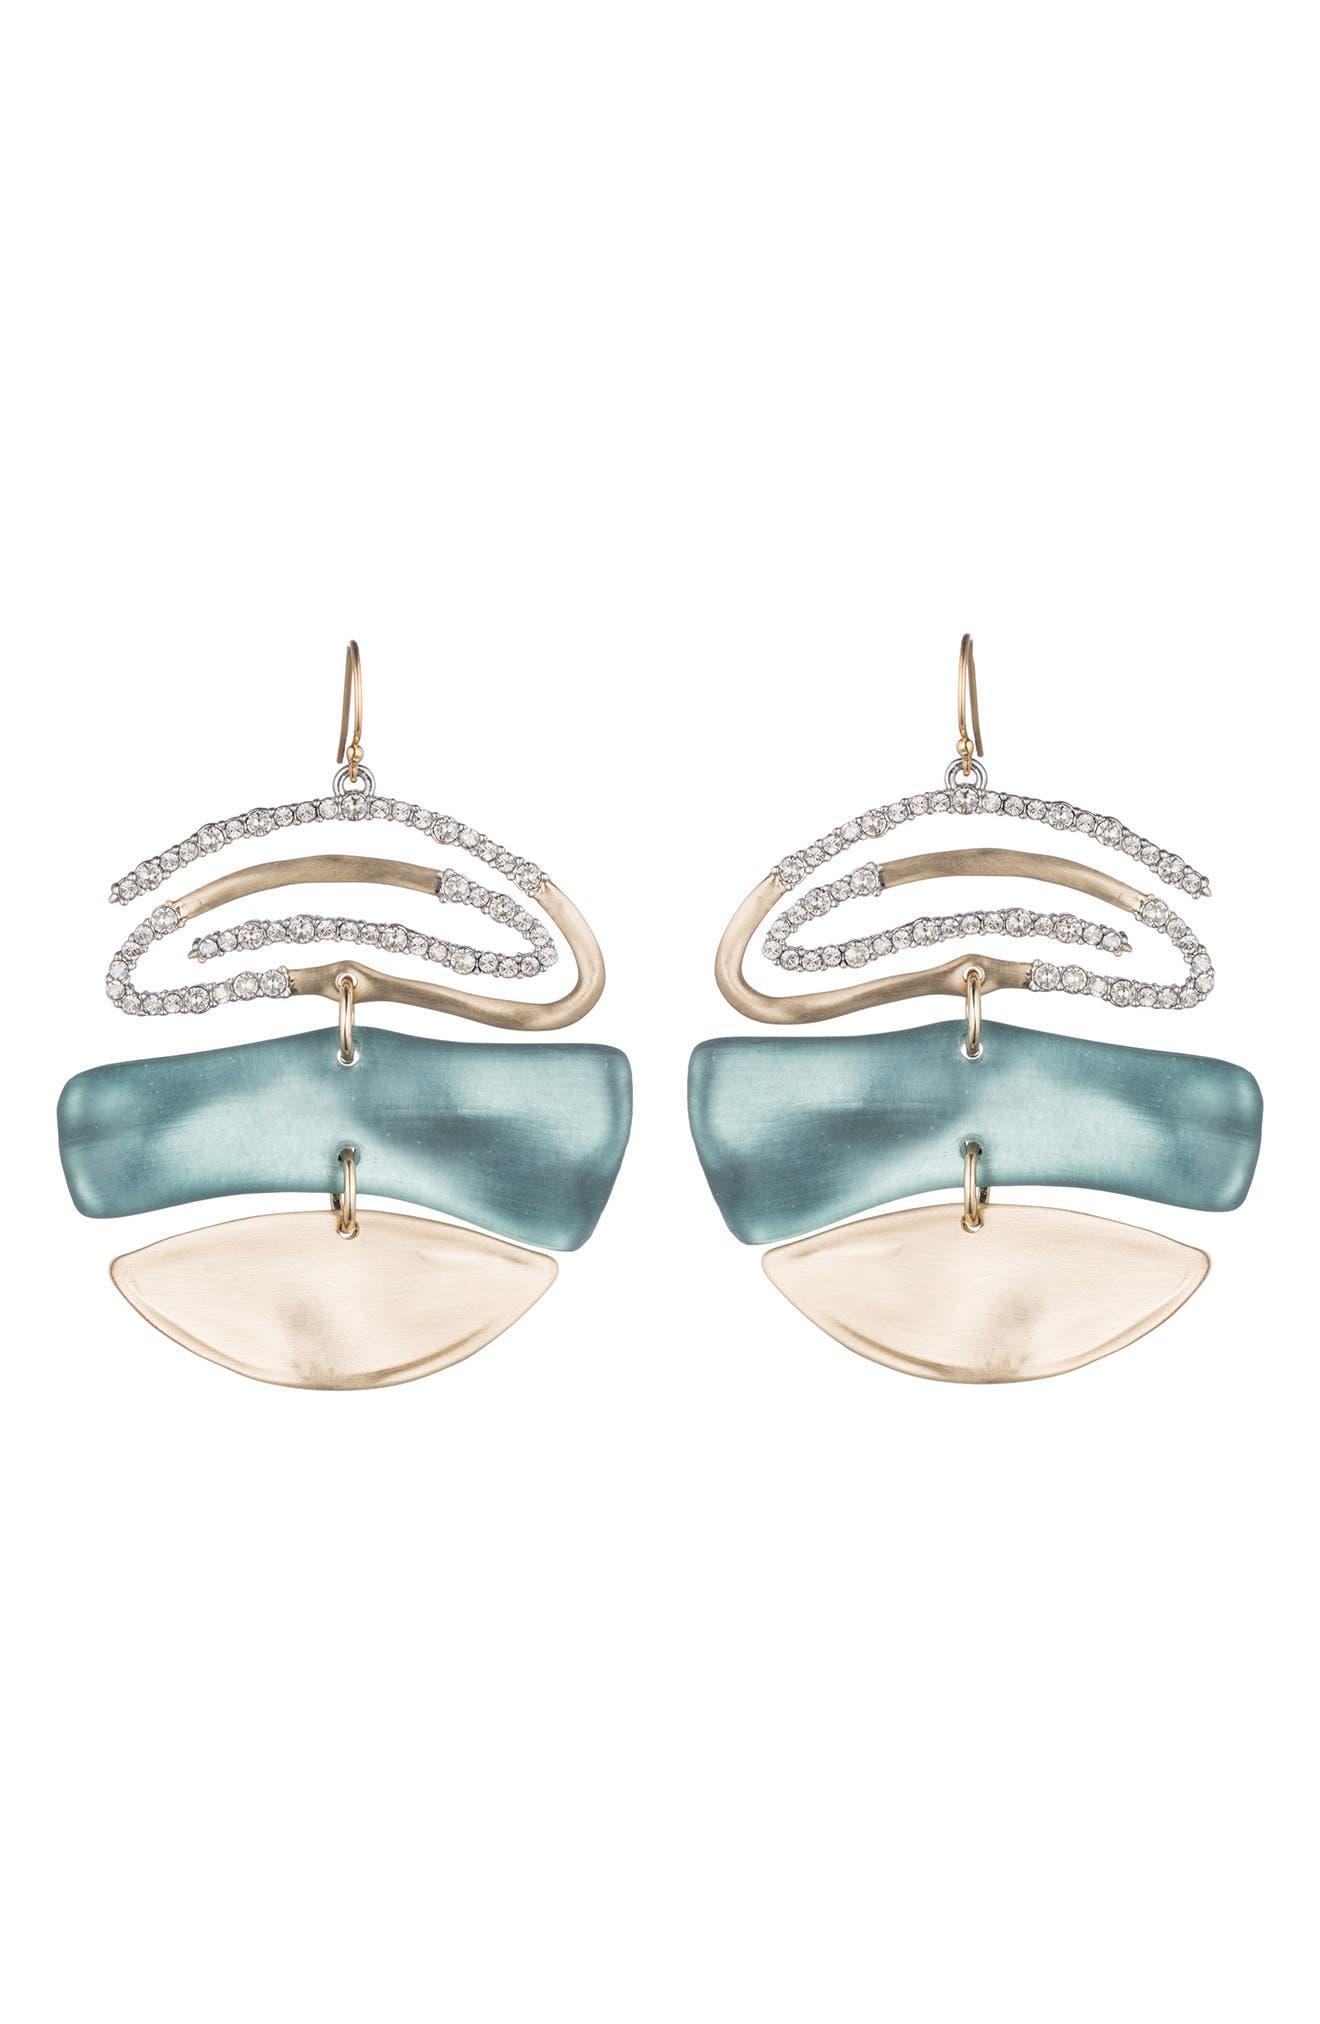 Crystal Encrusted Spiral Mobile Earrings,                         Main,                         color, 440